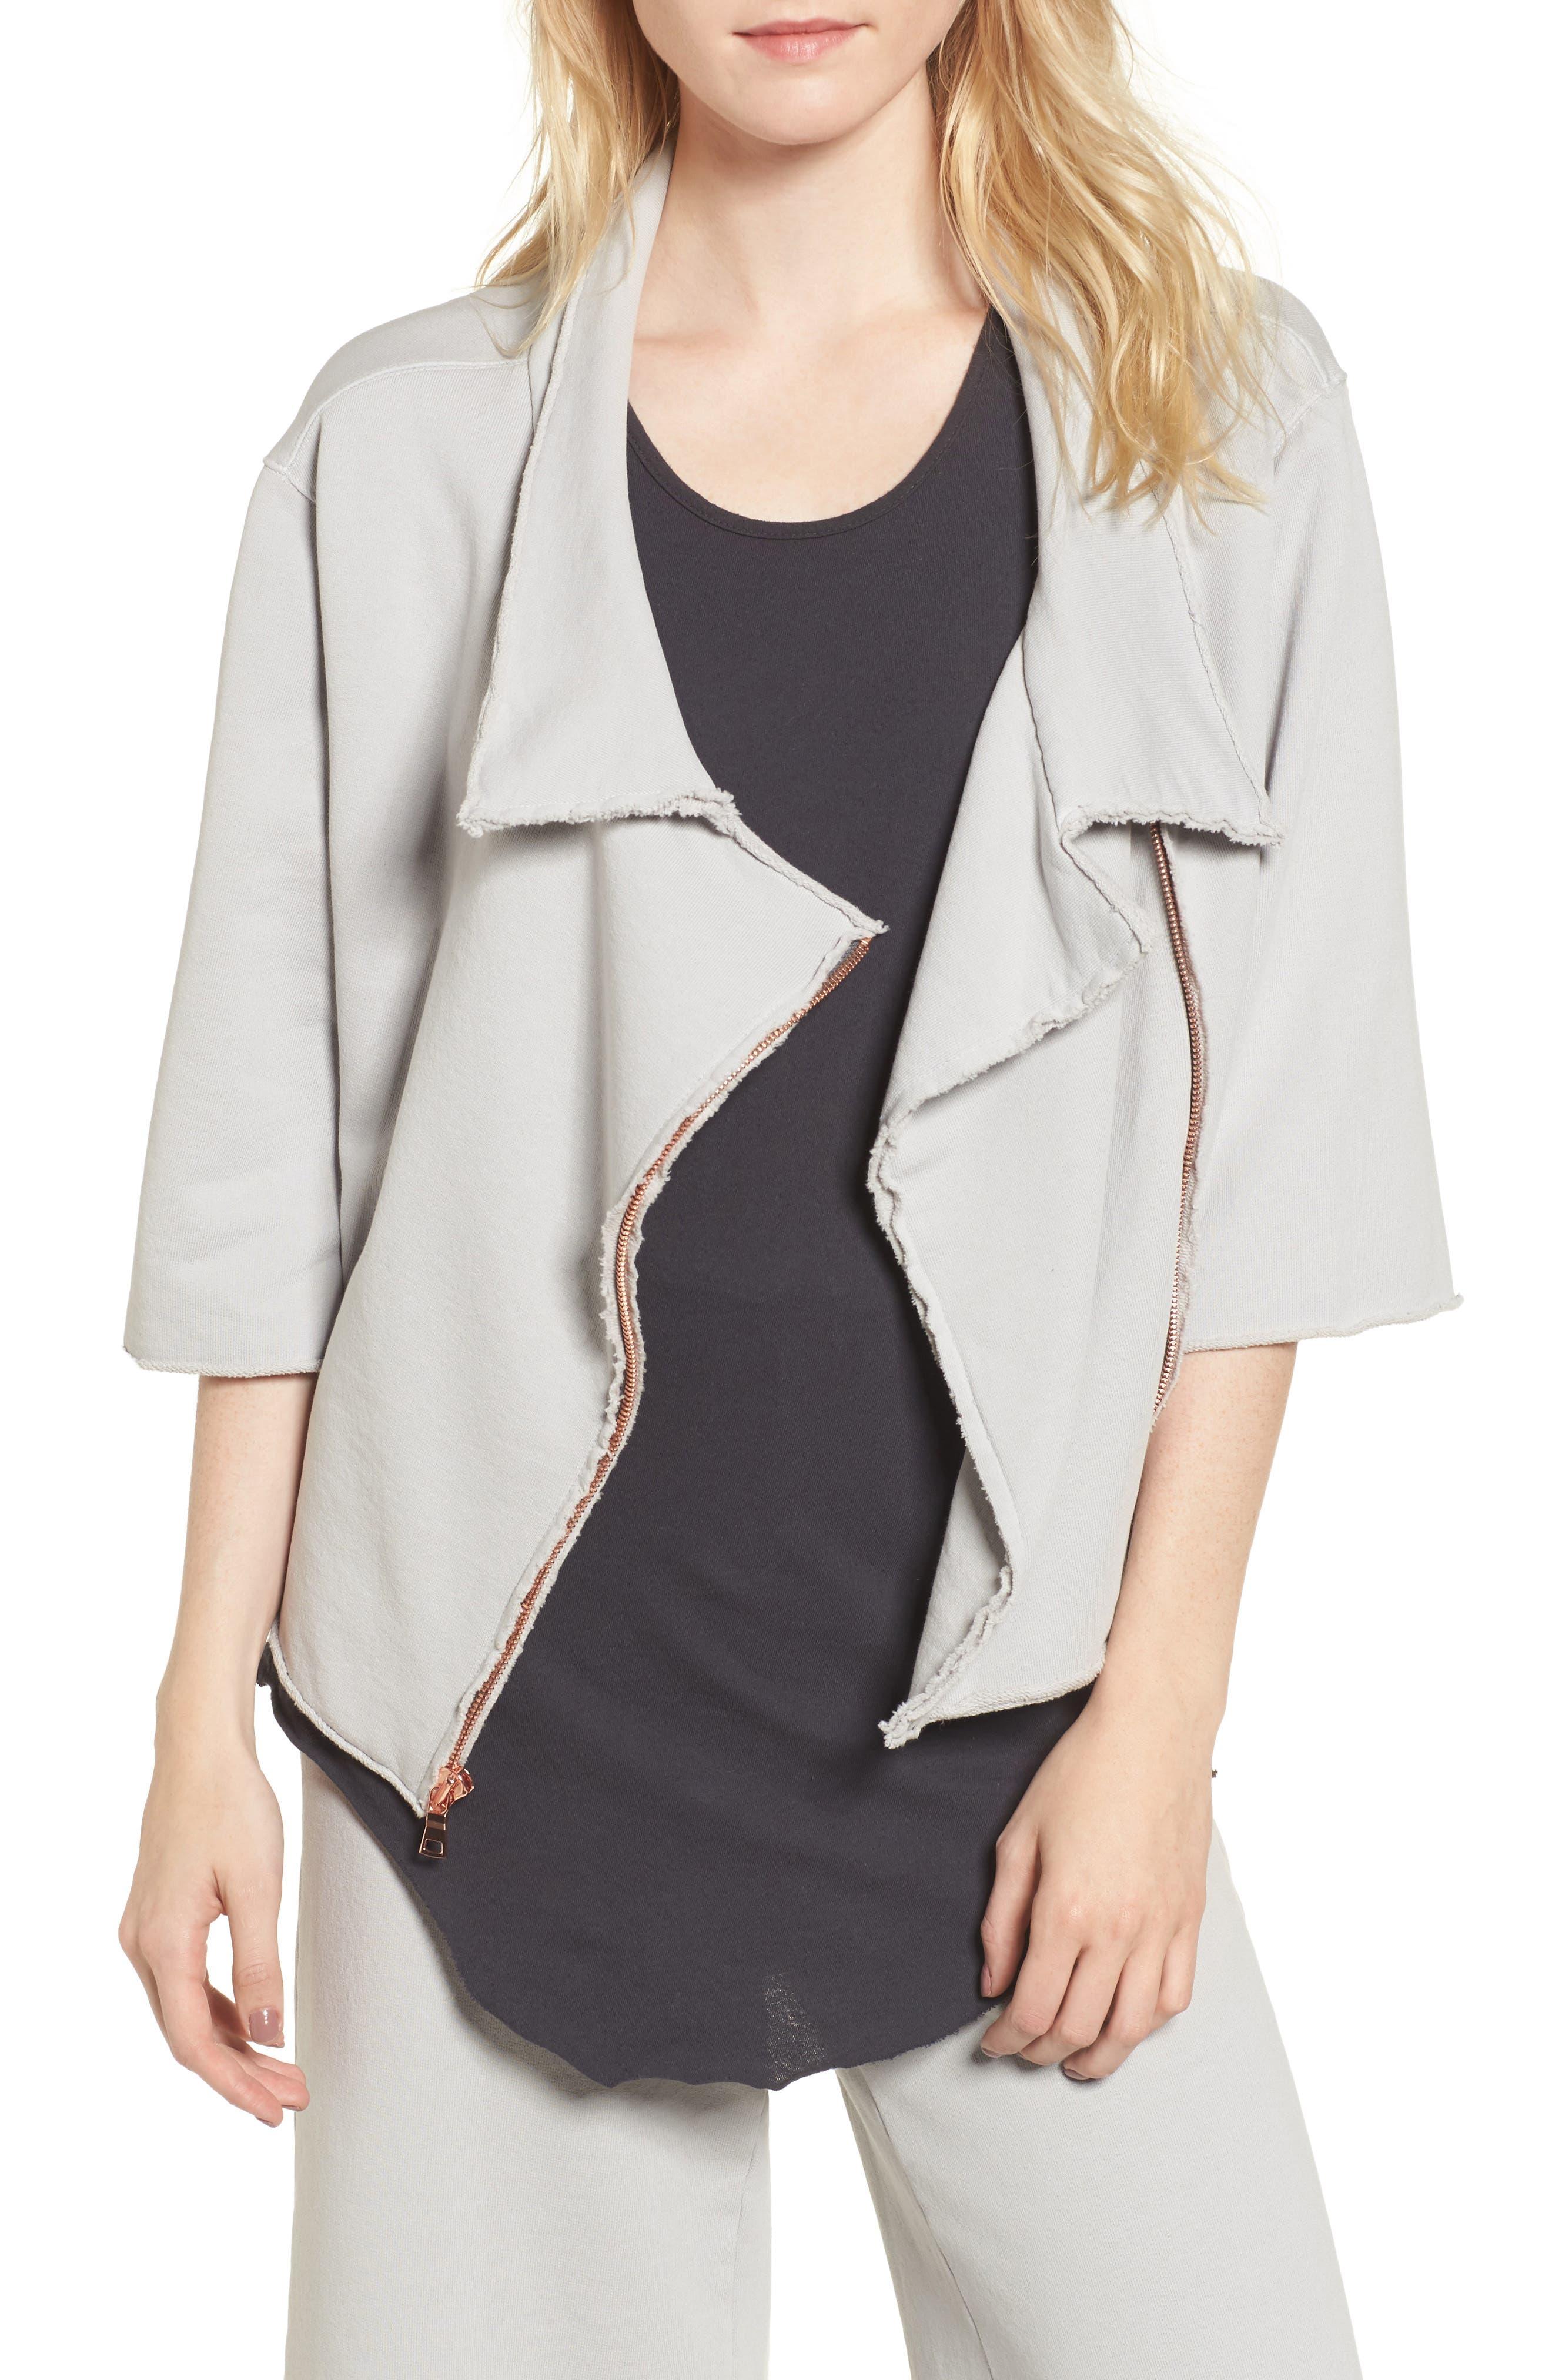 Alternate Image 1 Selected - Frank & Eileen Tee Lab Moto Zip Sweatshirt